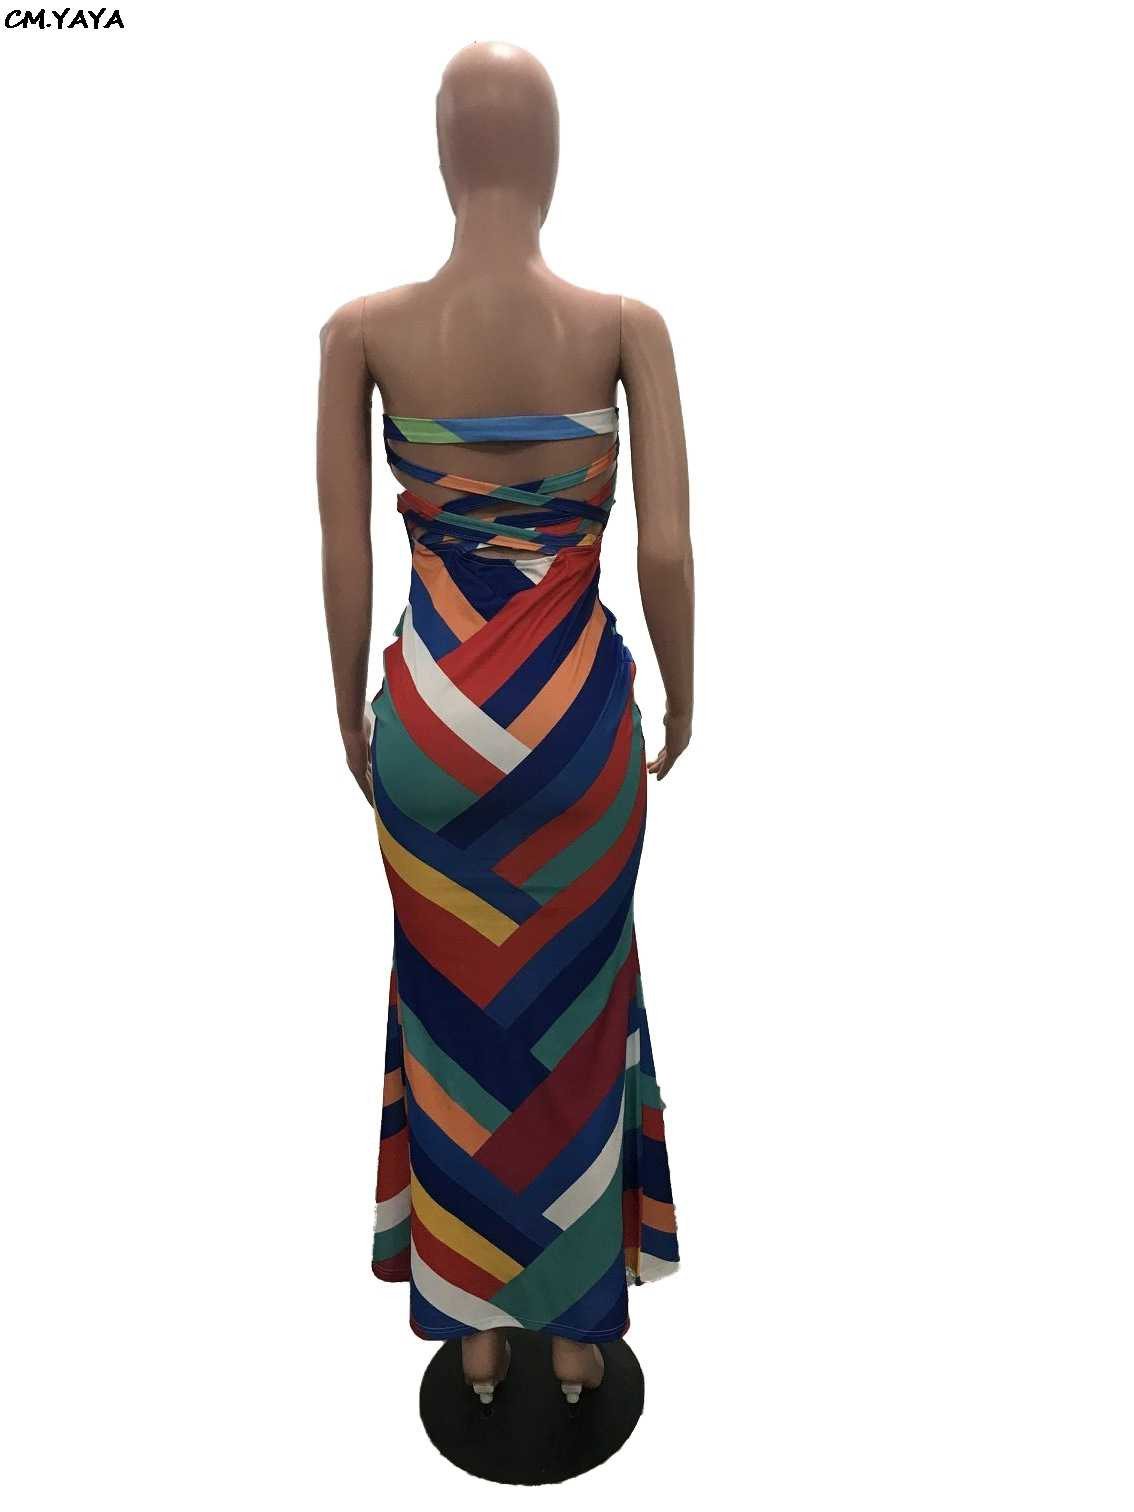 2019 new women colorful stripes strapless bodycon mermaid maxi midi dress beach party club long dresses beach outfit H6049